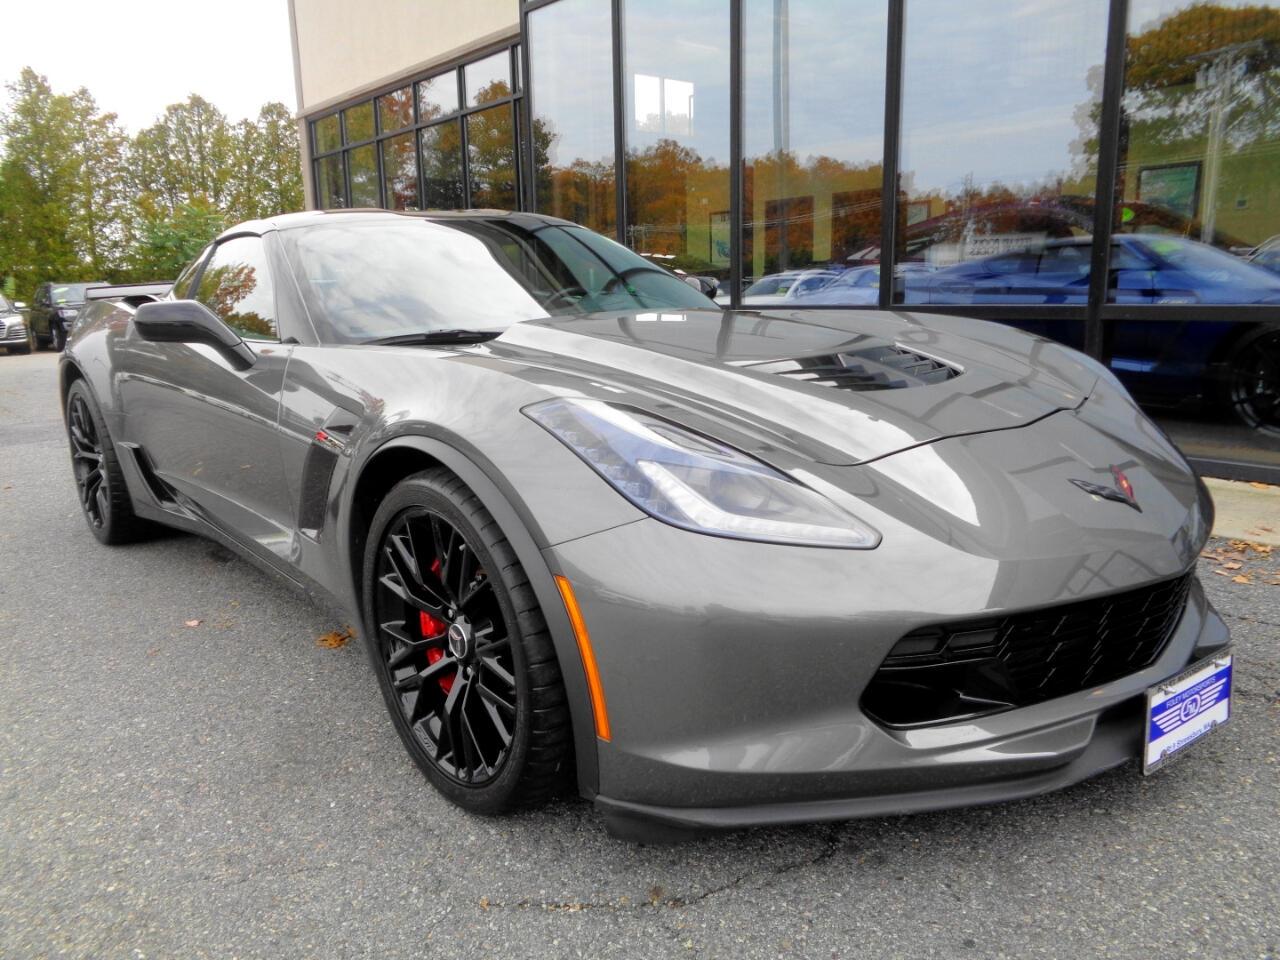 2015 Gray Chevrolet Corvette Z06 3LZ   C7 Corvette Photo 2